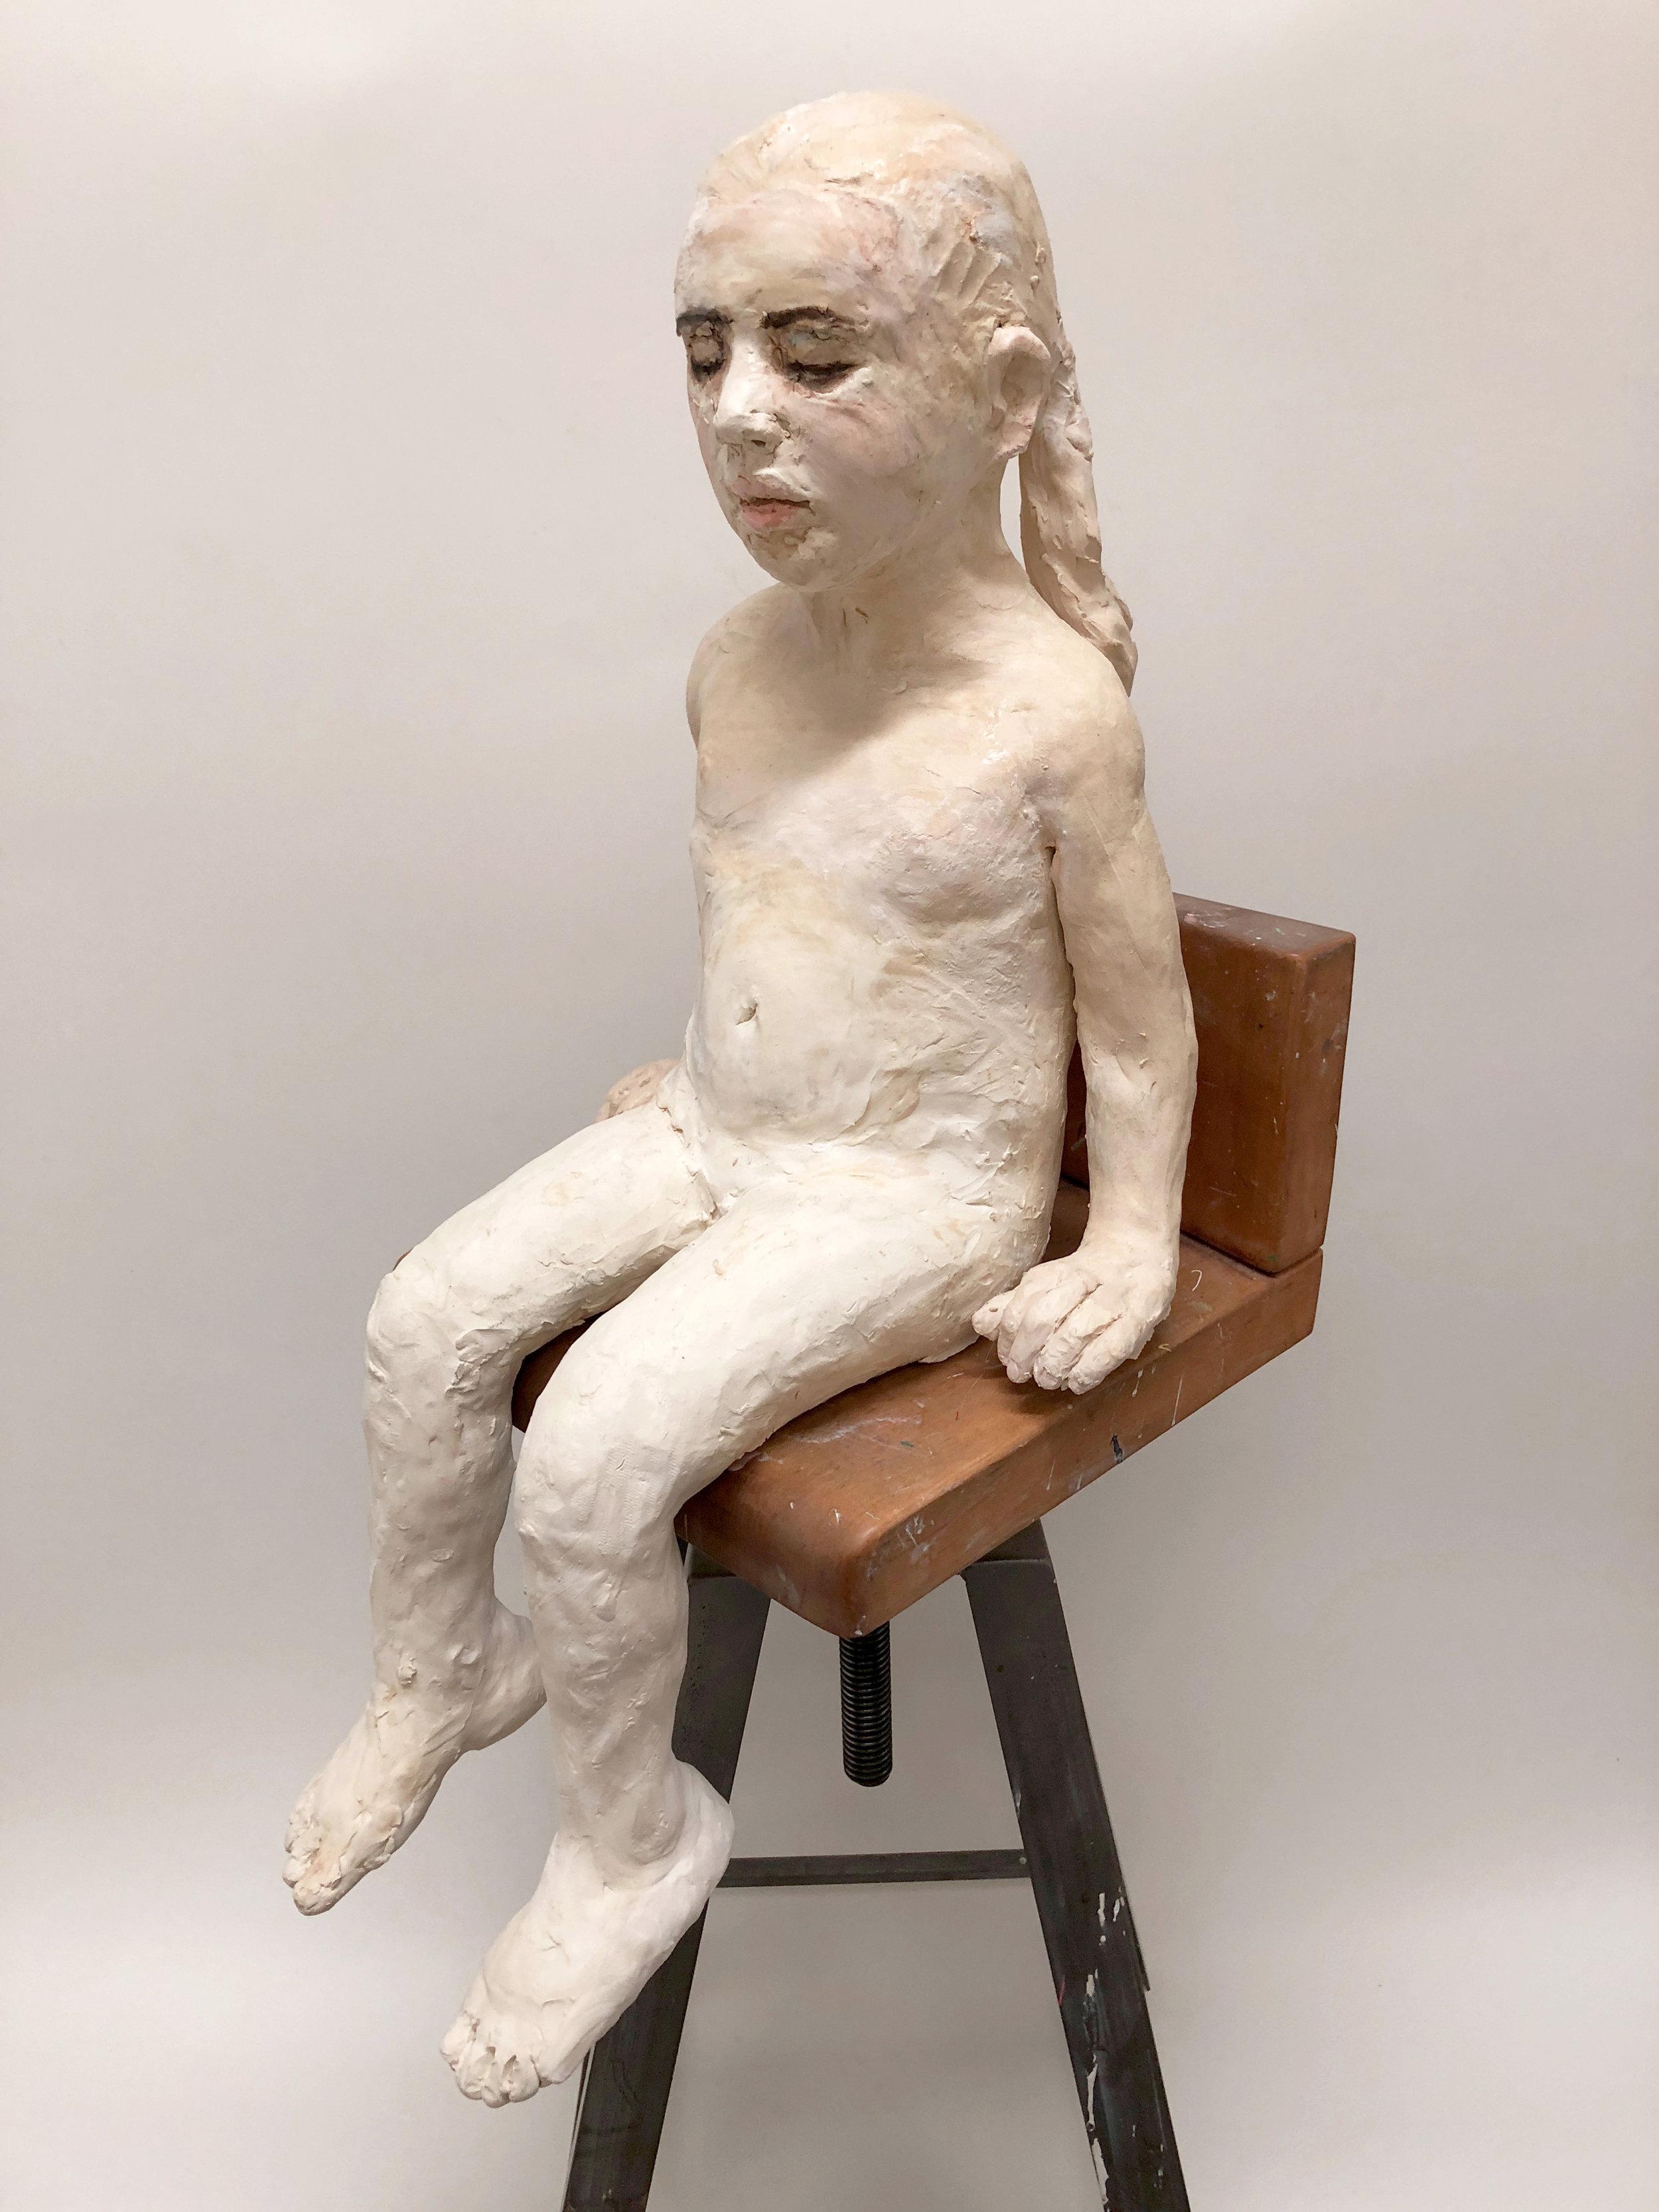 Untitled, (Girl on Stool), 2018, Ceramic, 29 1/2 x 15 x 15 in.